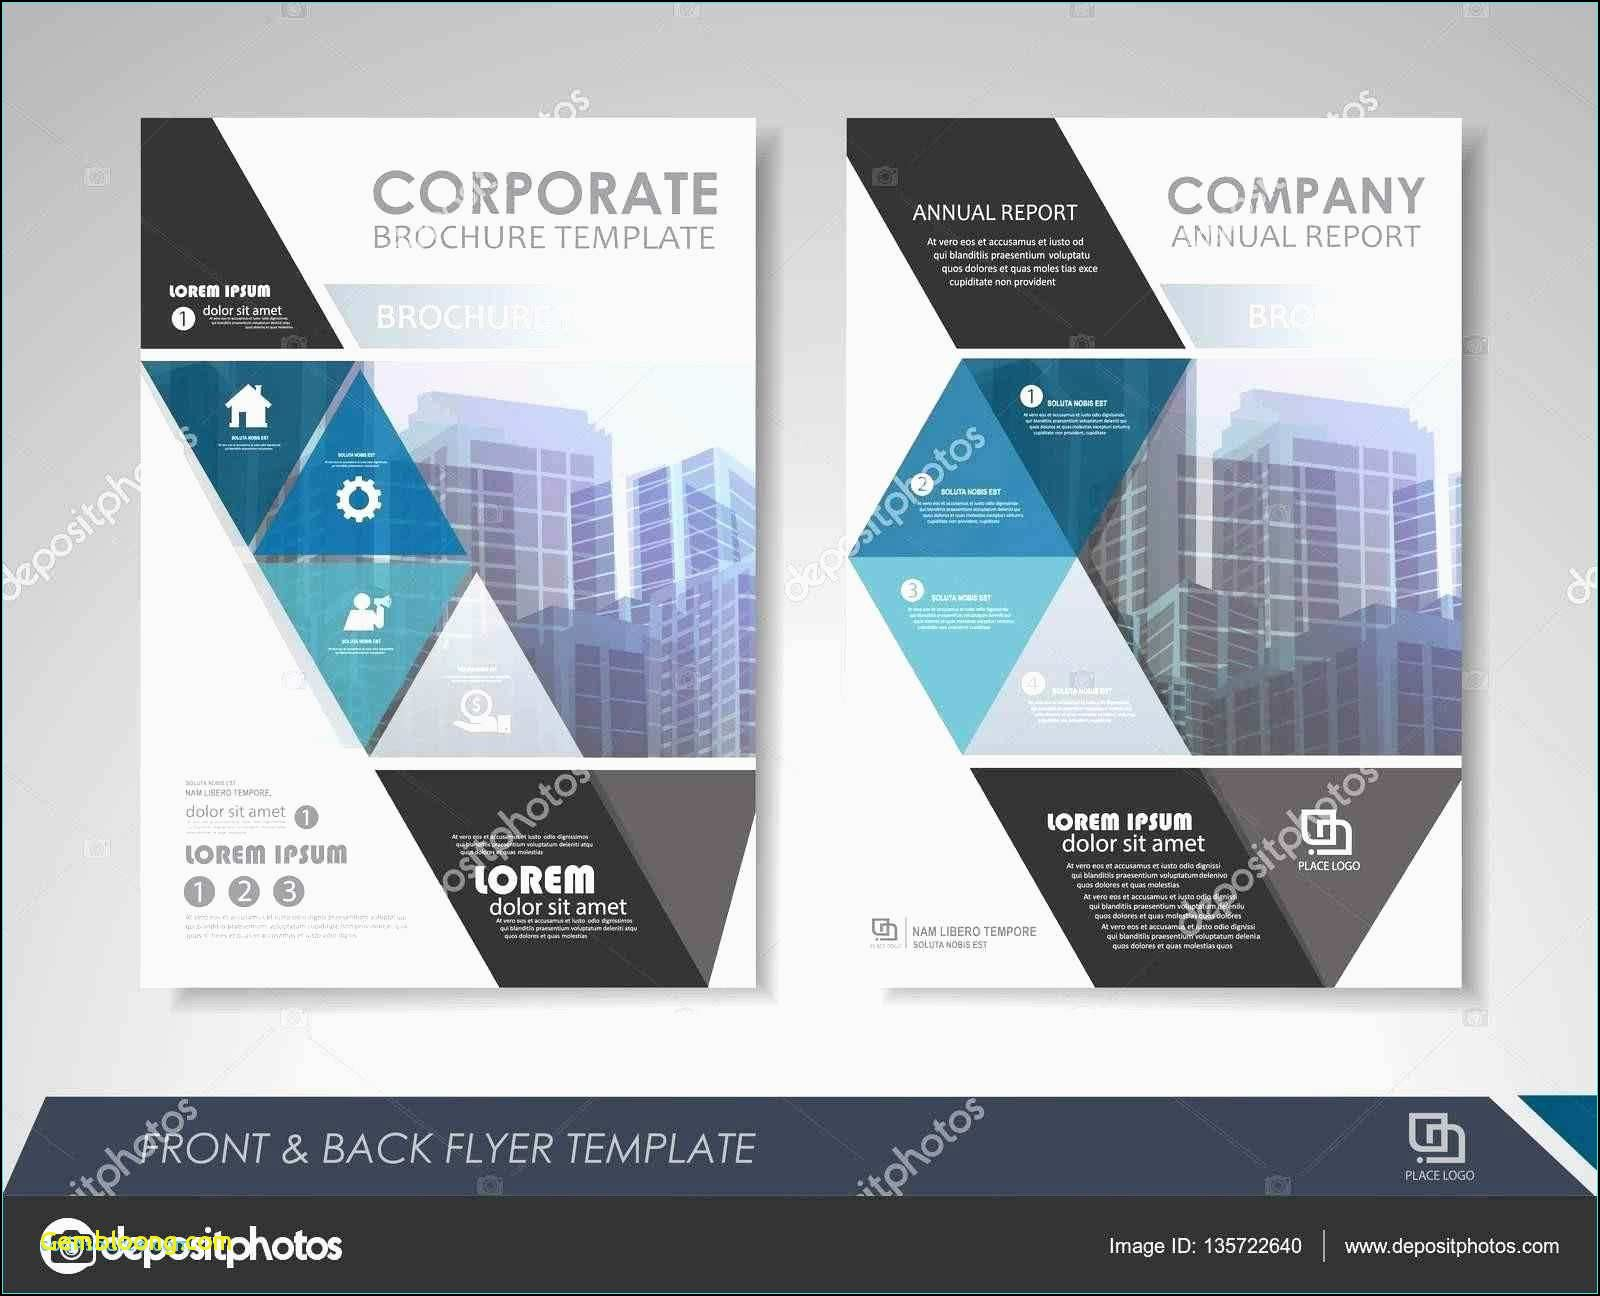 Unique 28 A4 Tri Fold Brochure Template Psd Free Download Free Brochure Template Indesign Brochure Templates Brochure Design Template